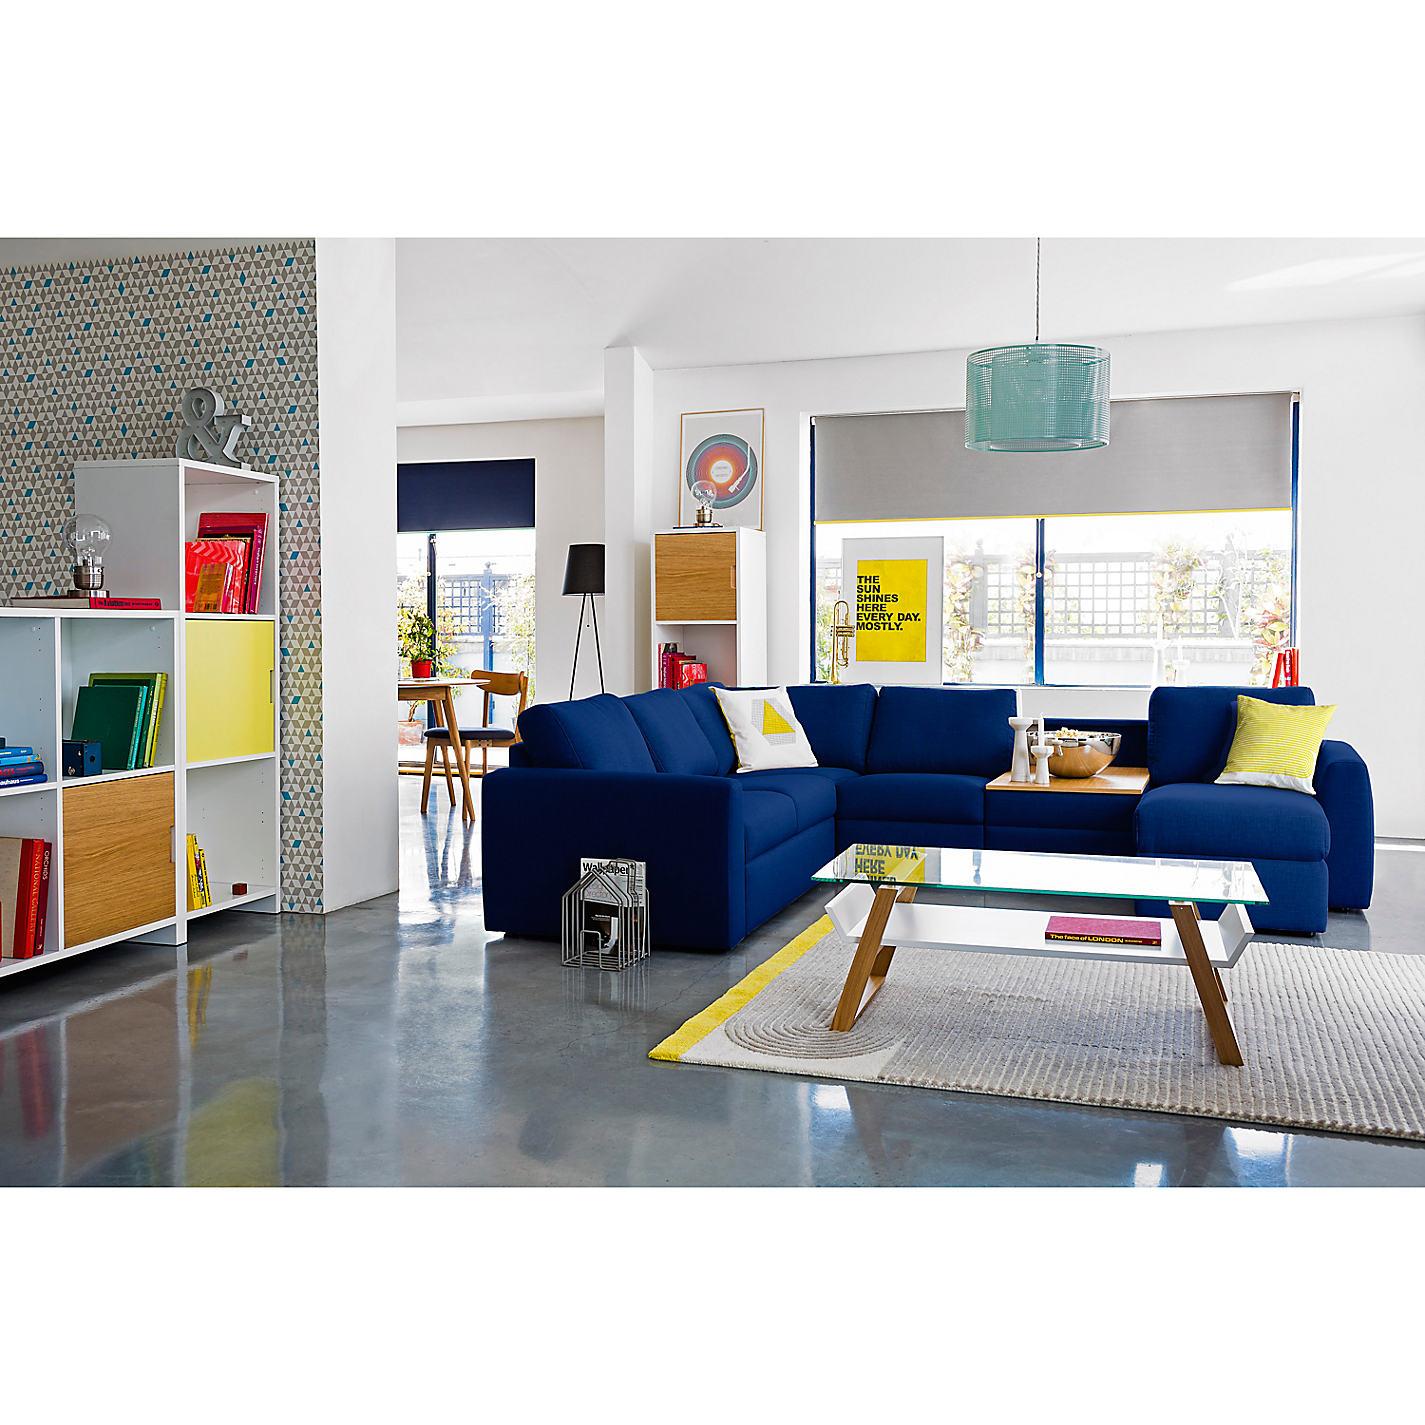 John Lewis Living Room Buy House By John Lewis Airframe Glass Coffee Table John Lewis